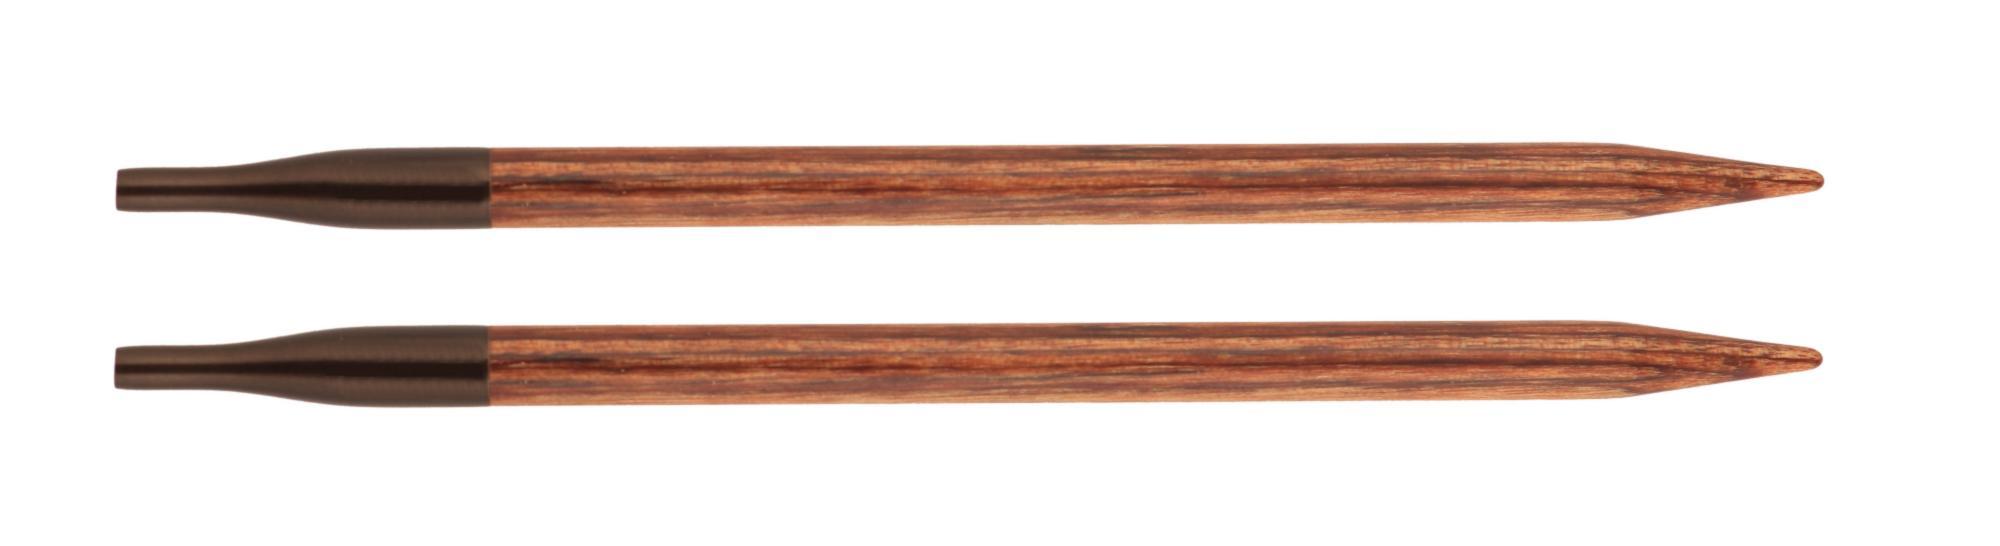 31216 Спицы съемные 15.00 мм Ginger KnitPro